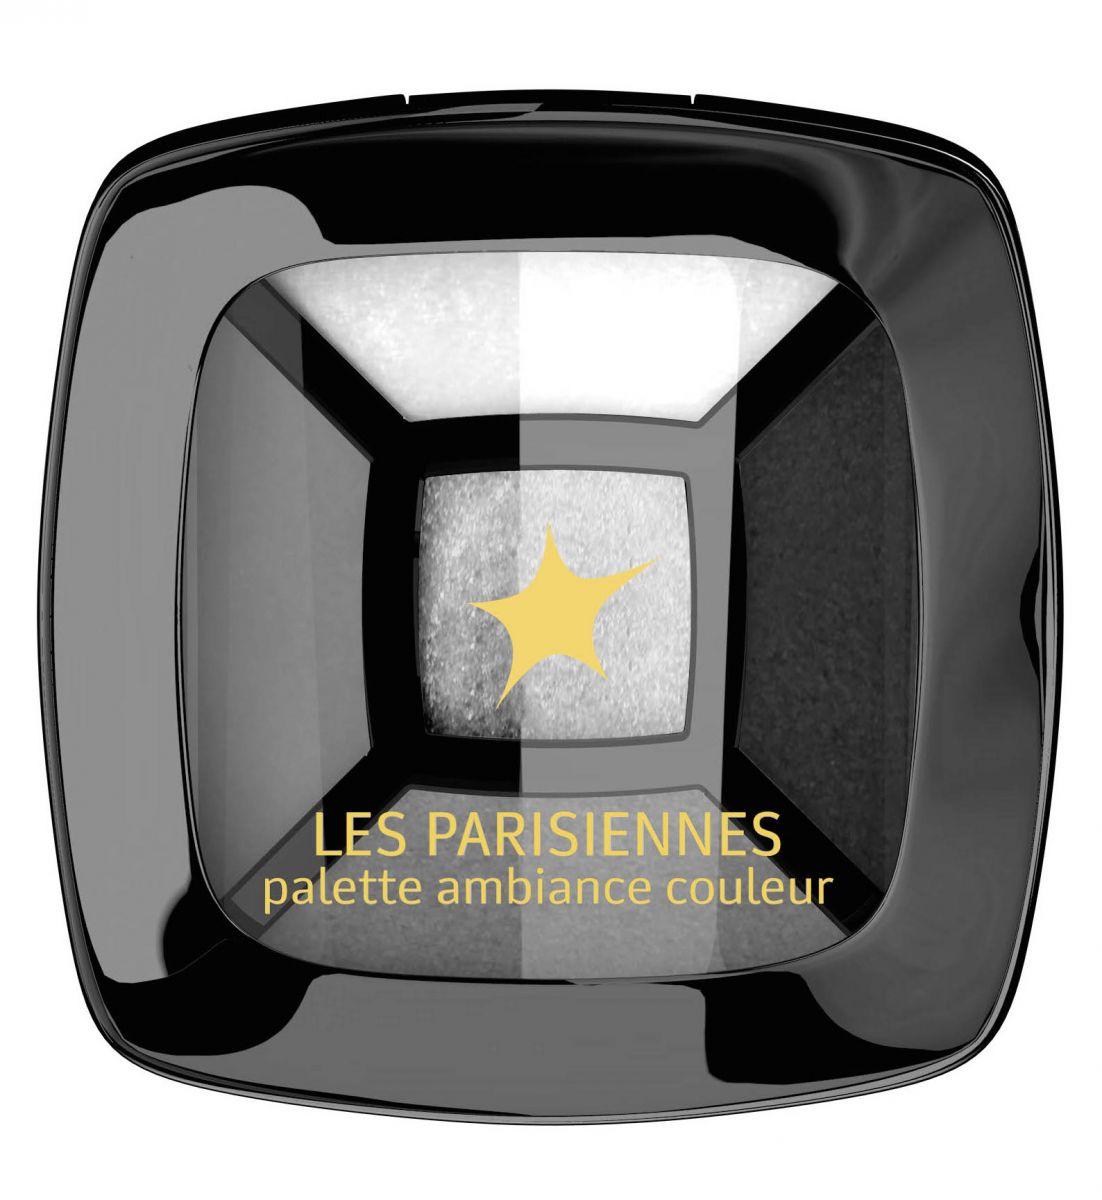 новинки коллекции косметики L'etoile sélection сезона осень 2015